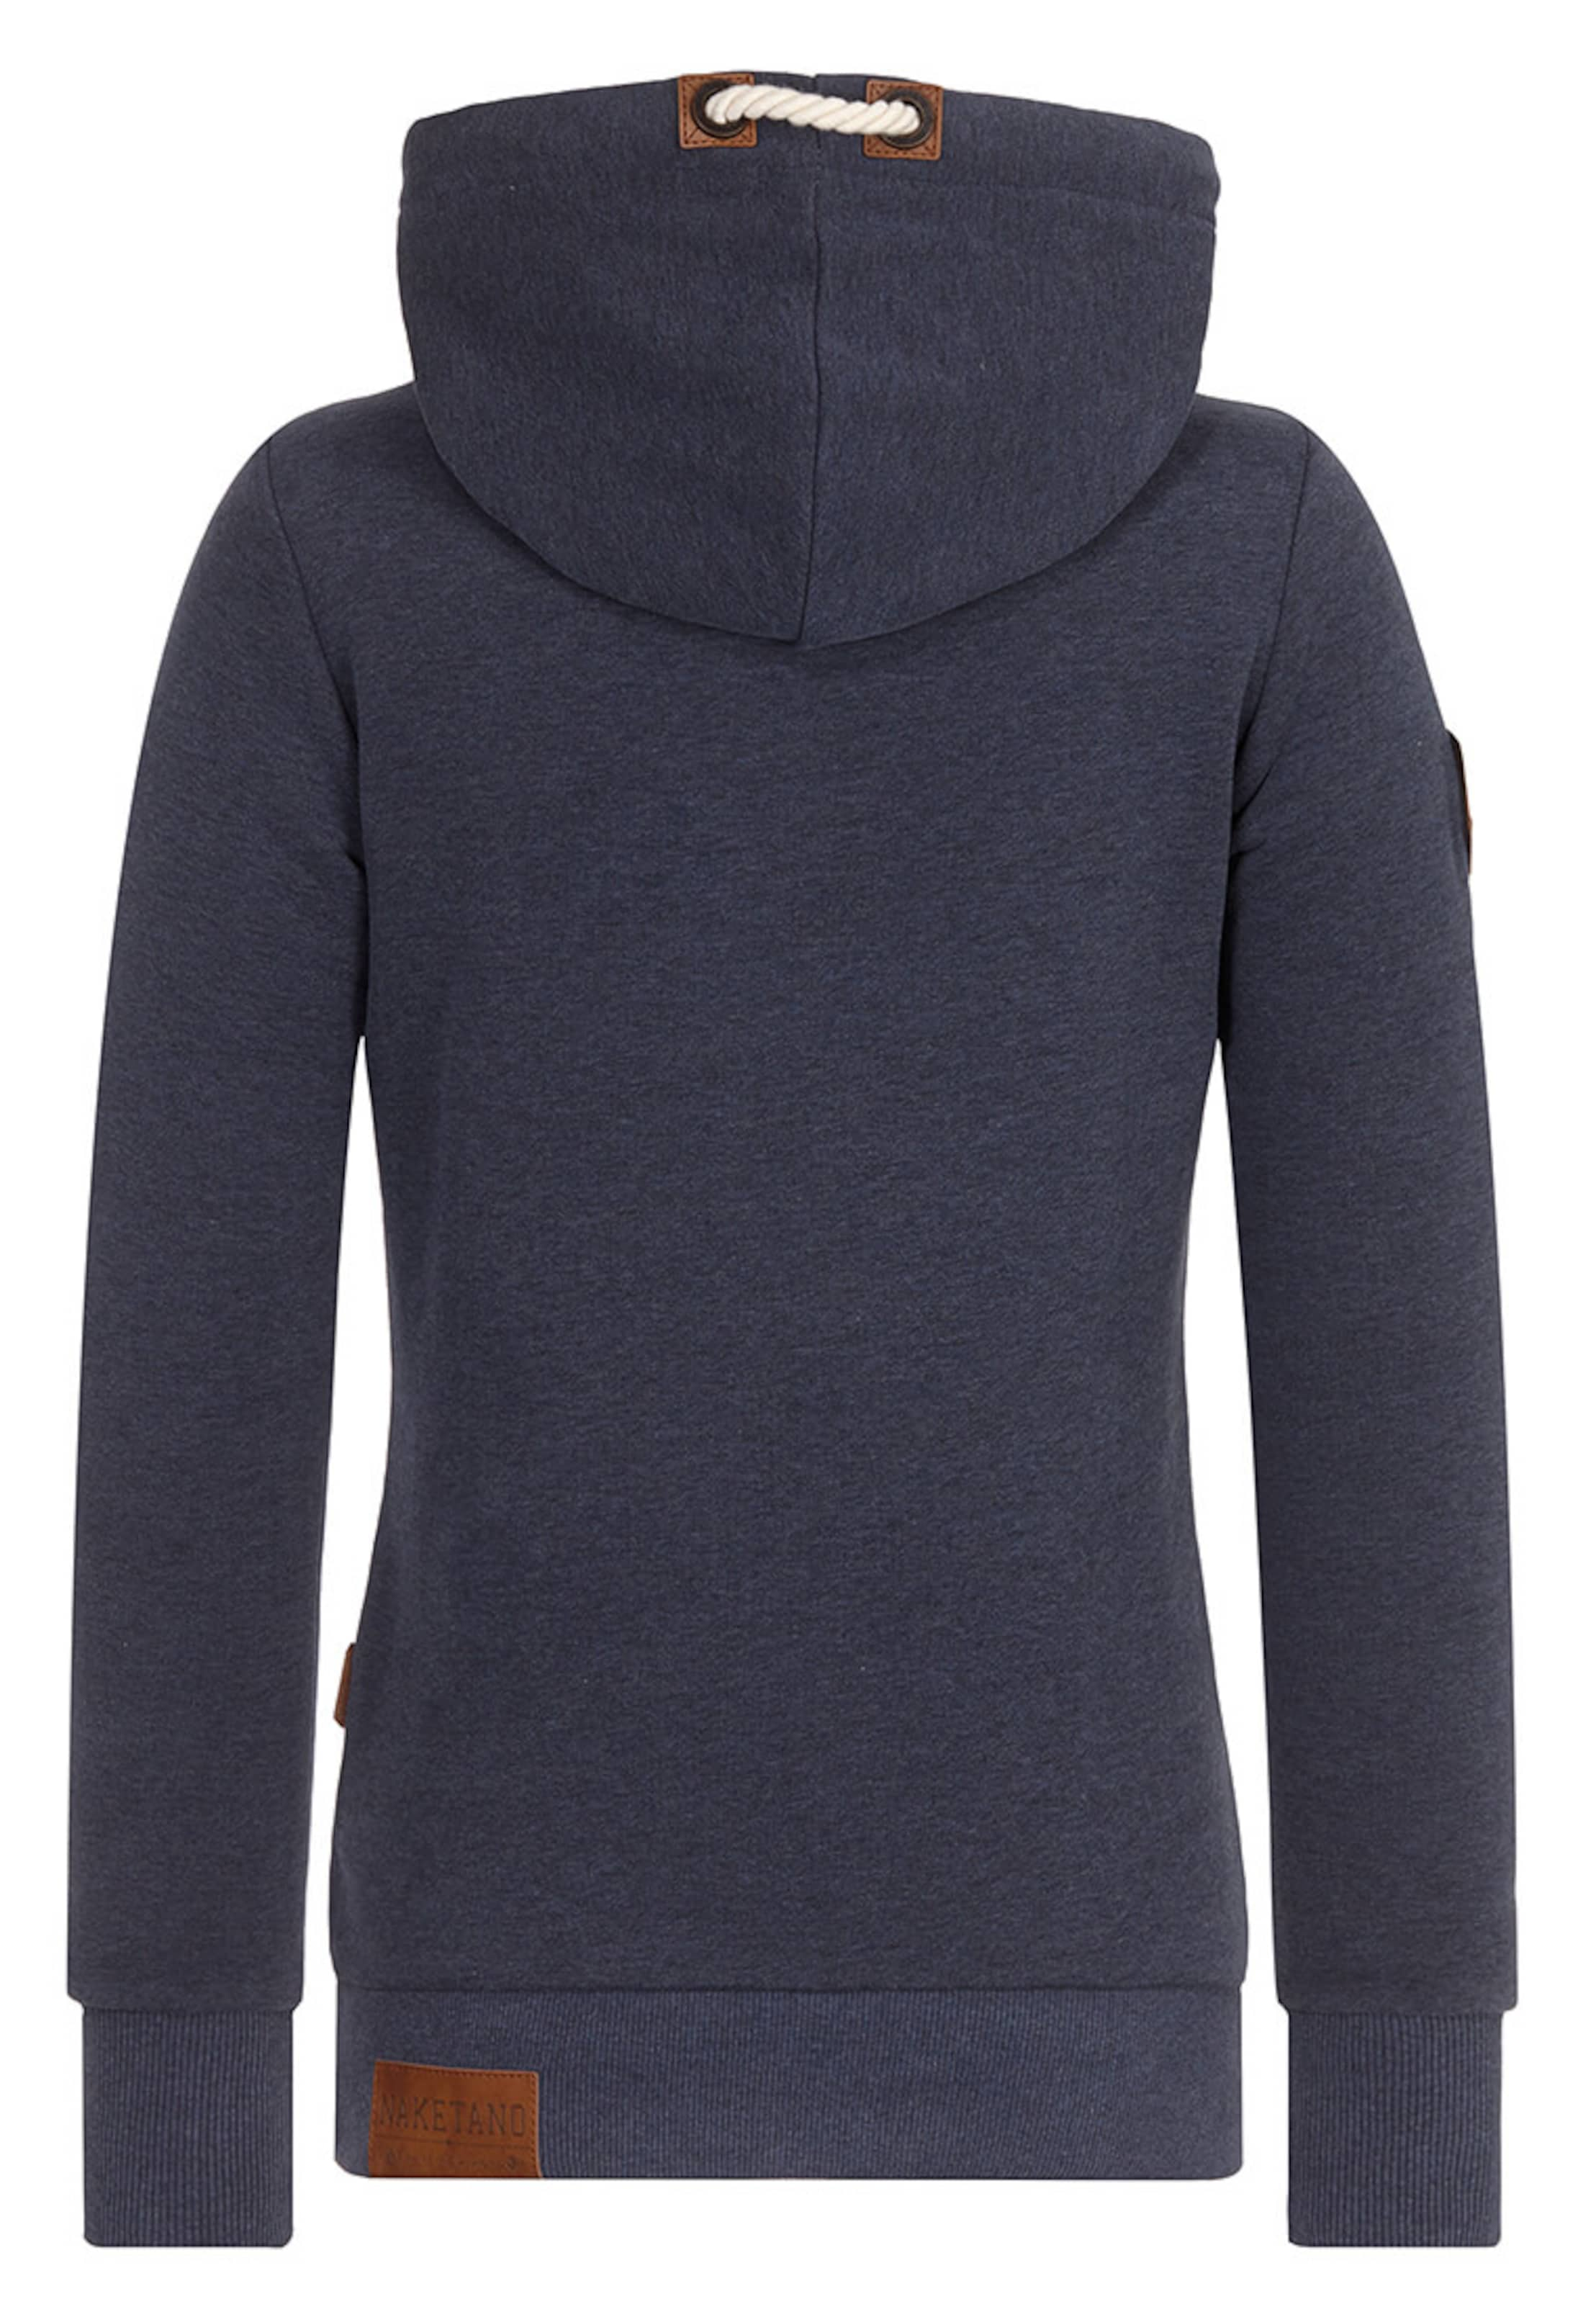 Blanc En NuitMarron shirt Sweat 'darth' Bleu Naketano SMpqLzGjUV